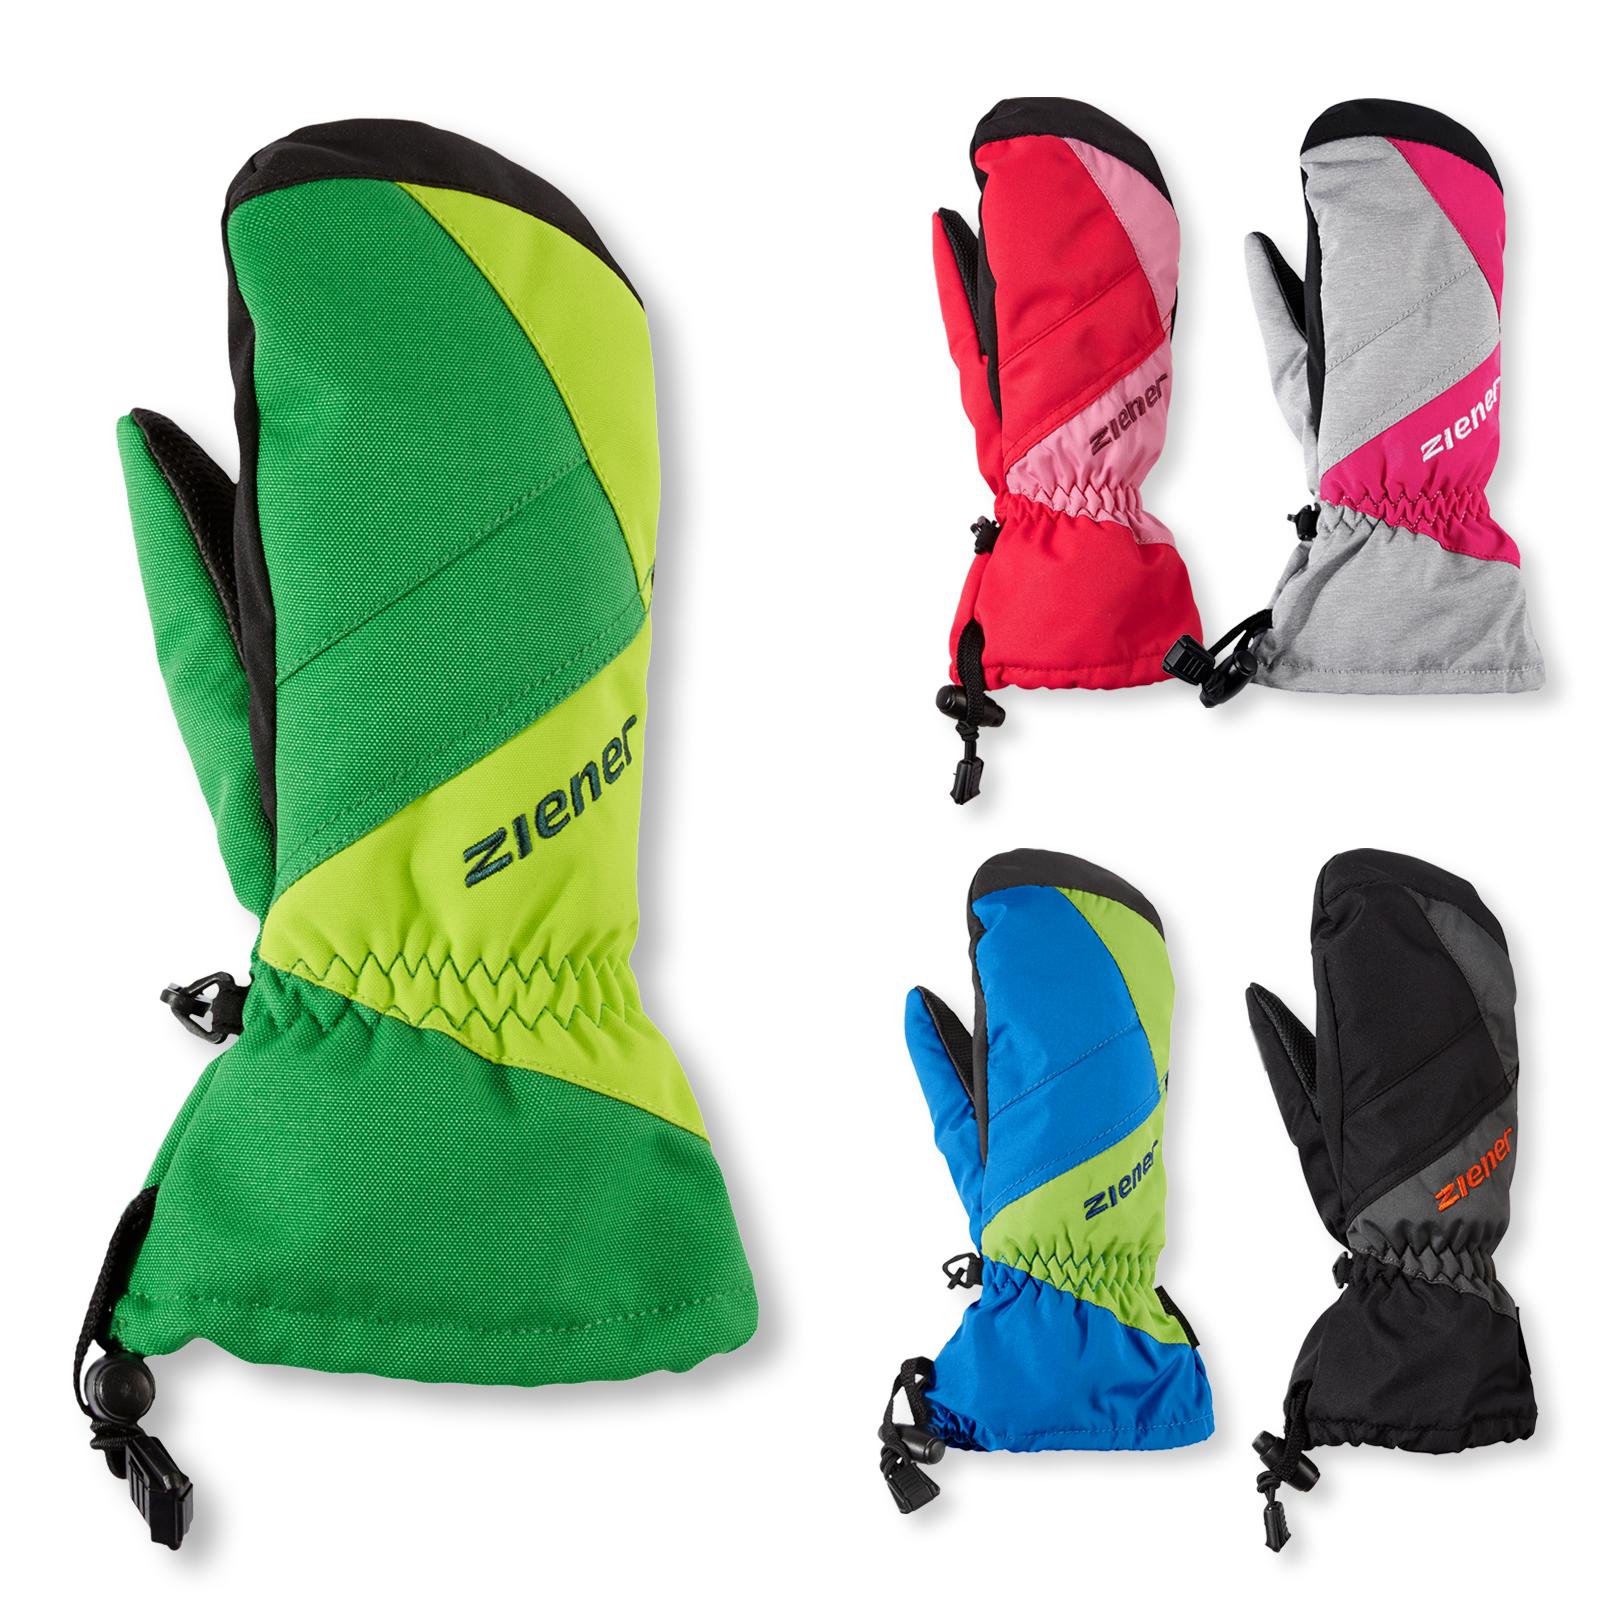 Ziener Skihandschuhe AGILO AS® glove Junior Fäustlinge Kinder in Farbwahl